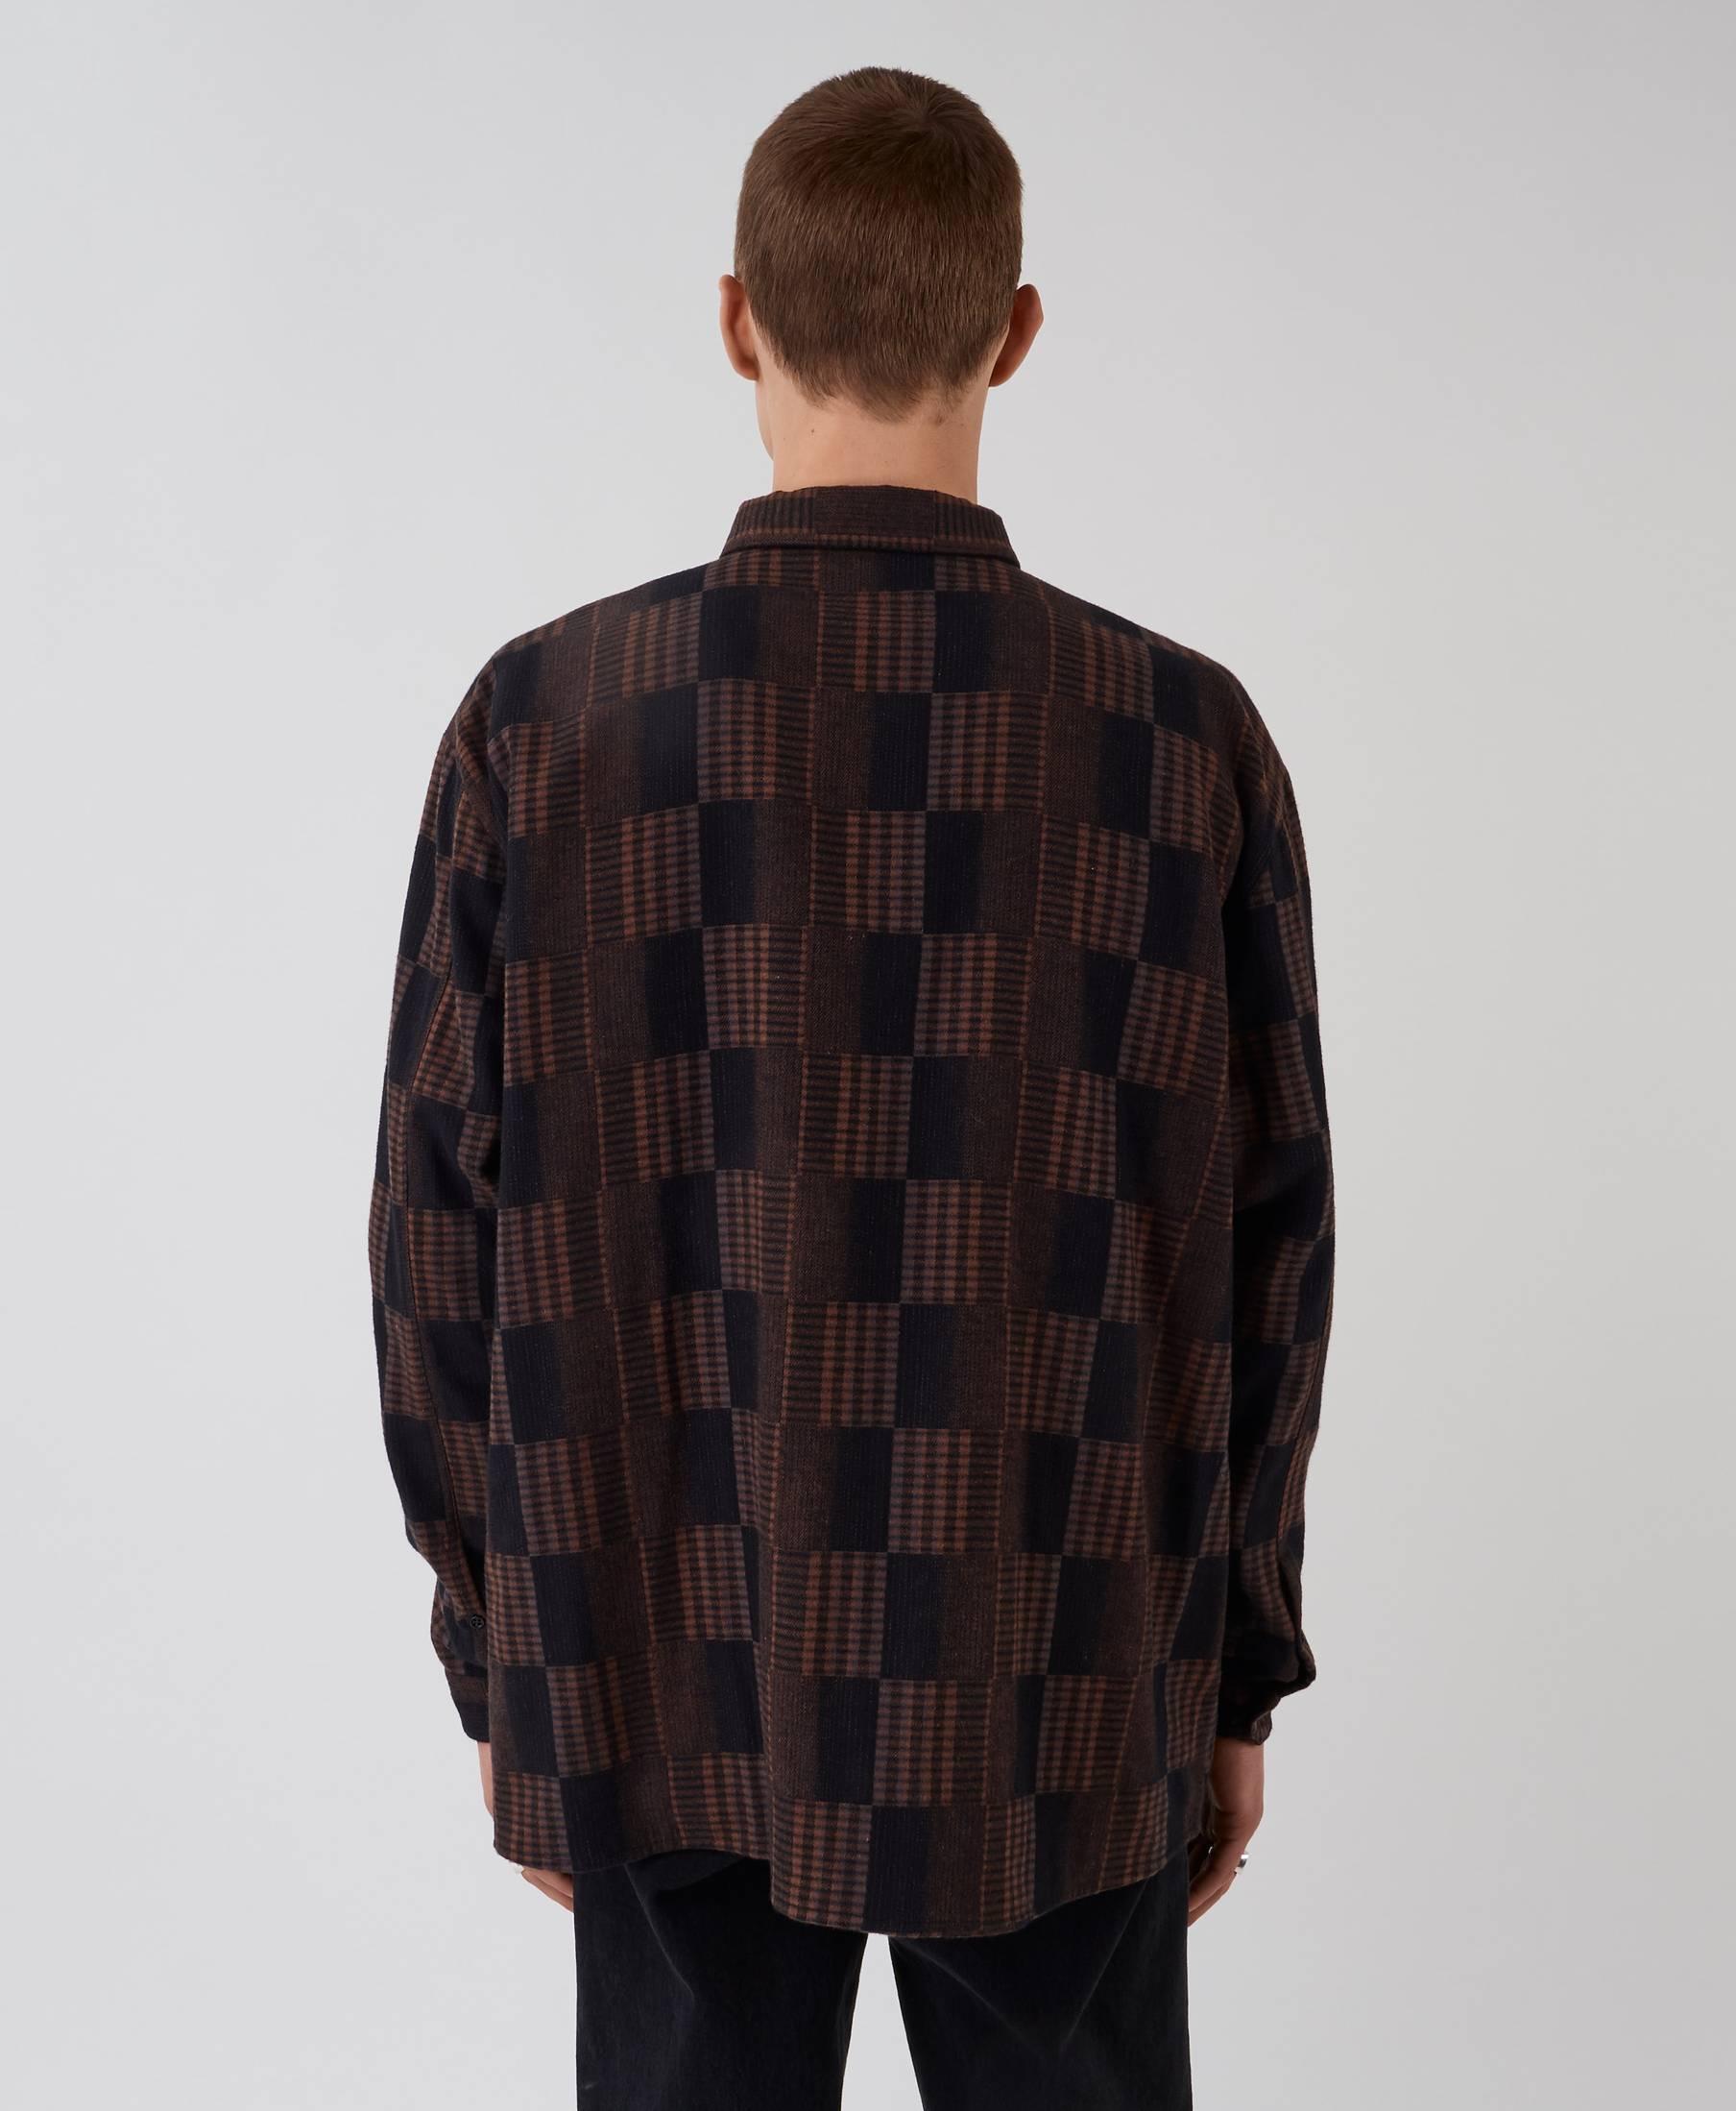 Penrose Shirt Brown Check